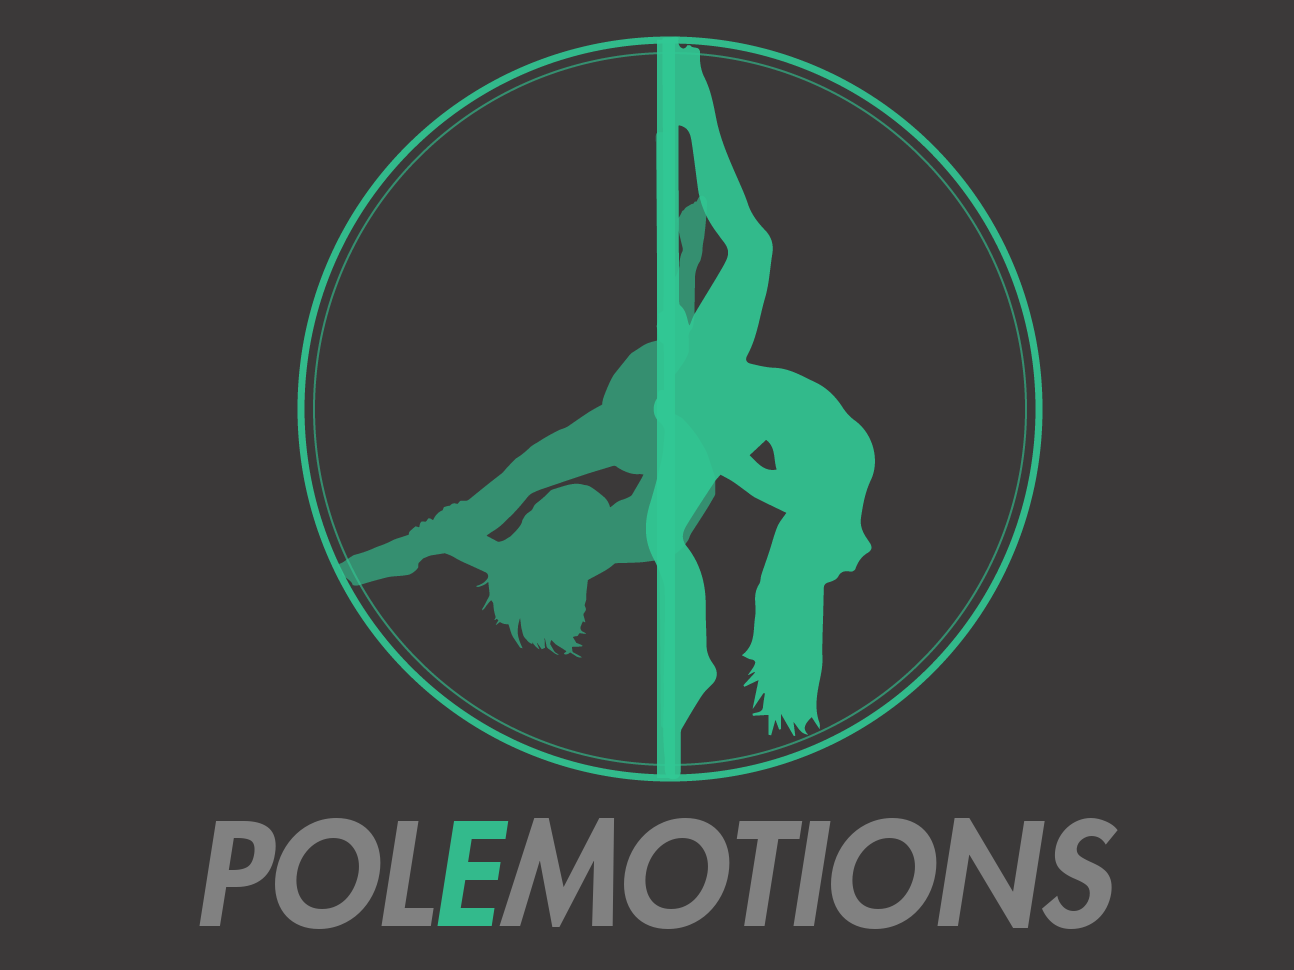 Polemotions